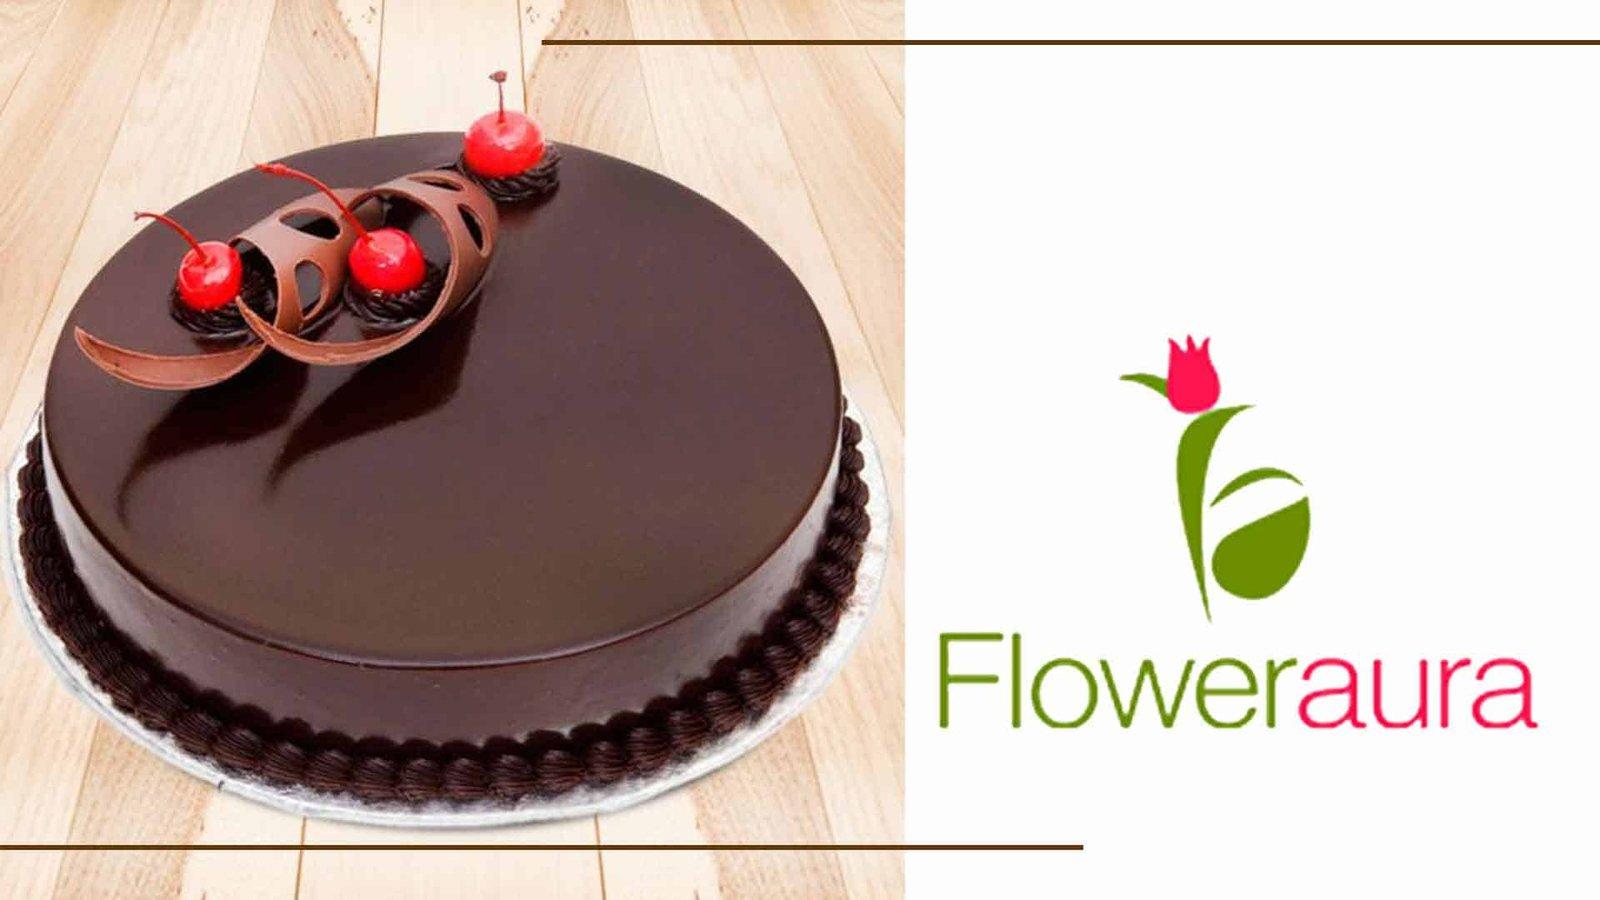 floweraura- online cake